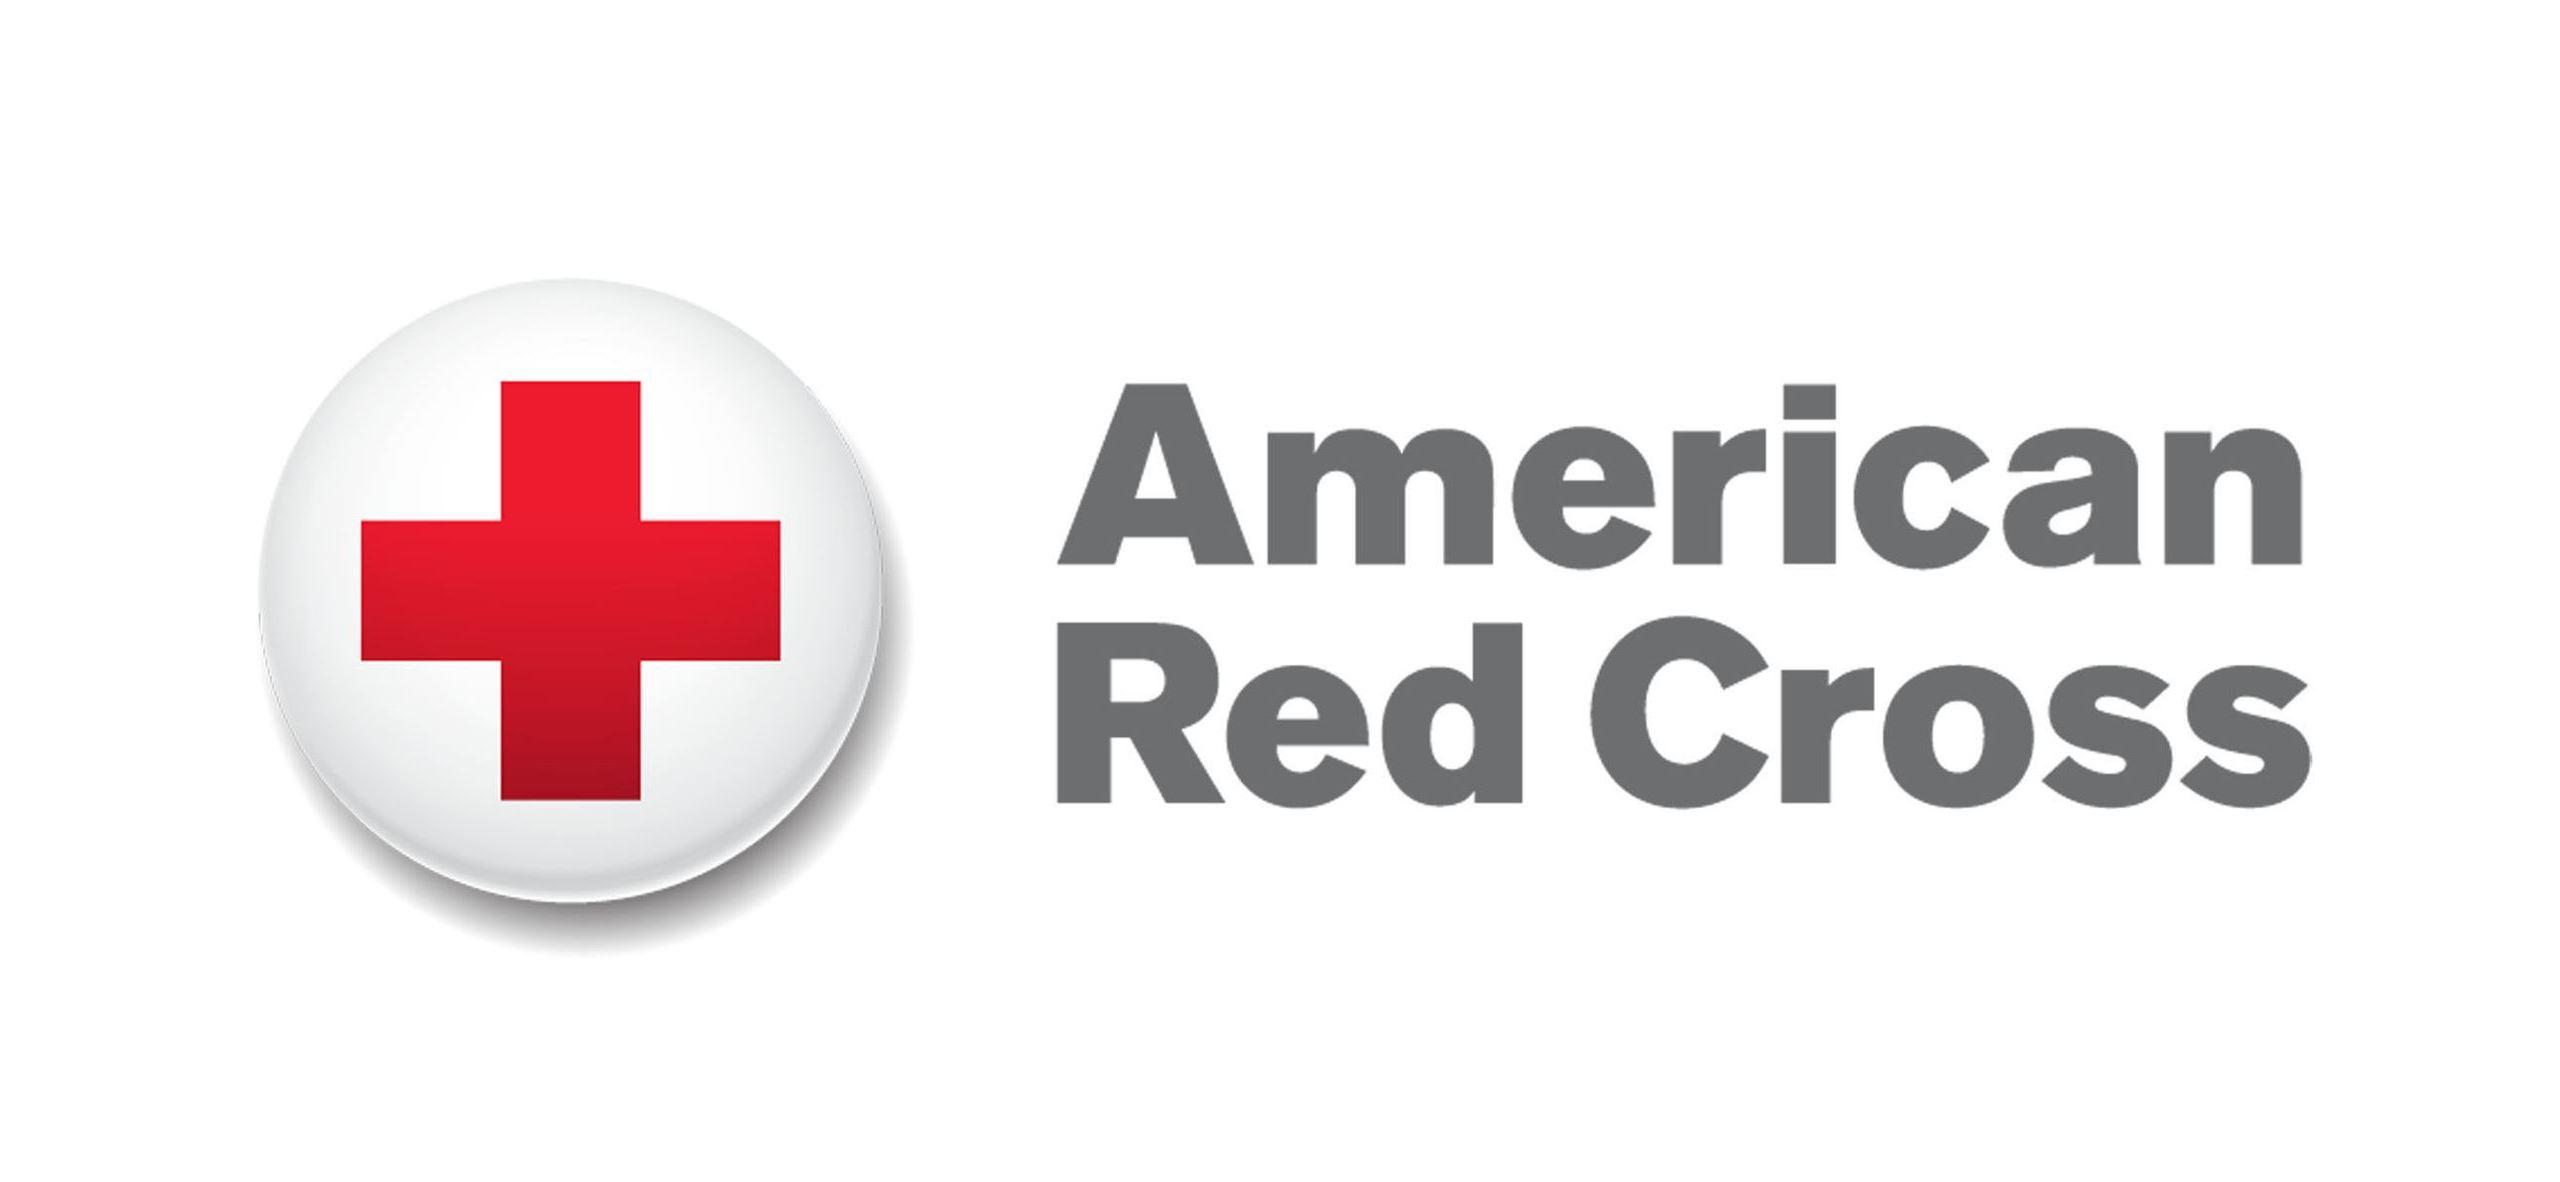 american red cross_1543433925504.jpg.jpg